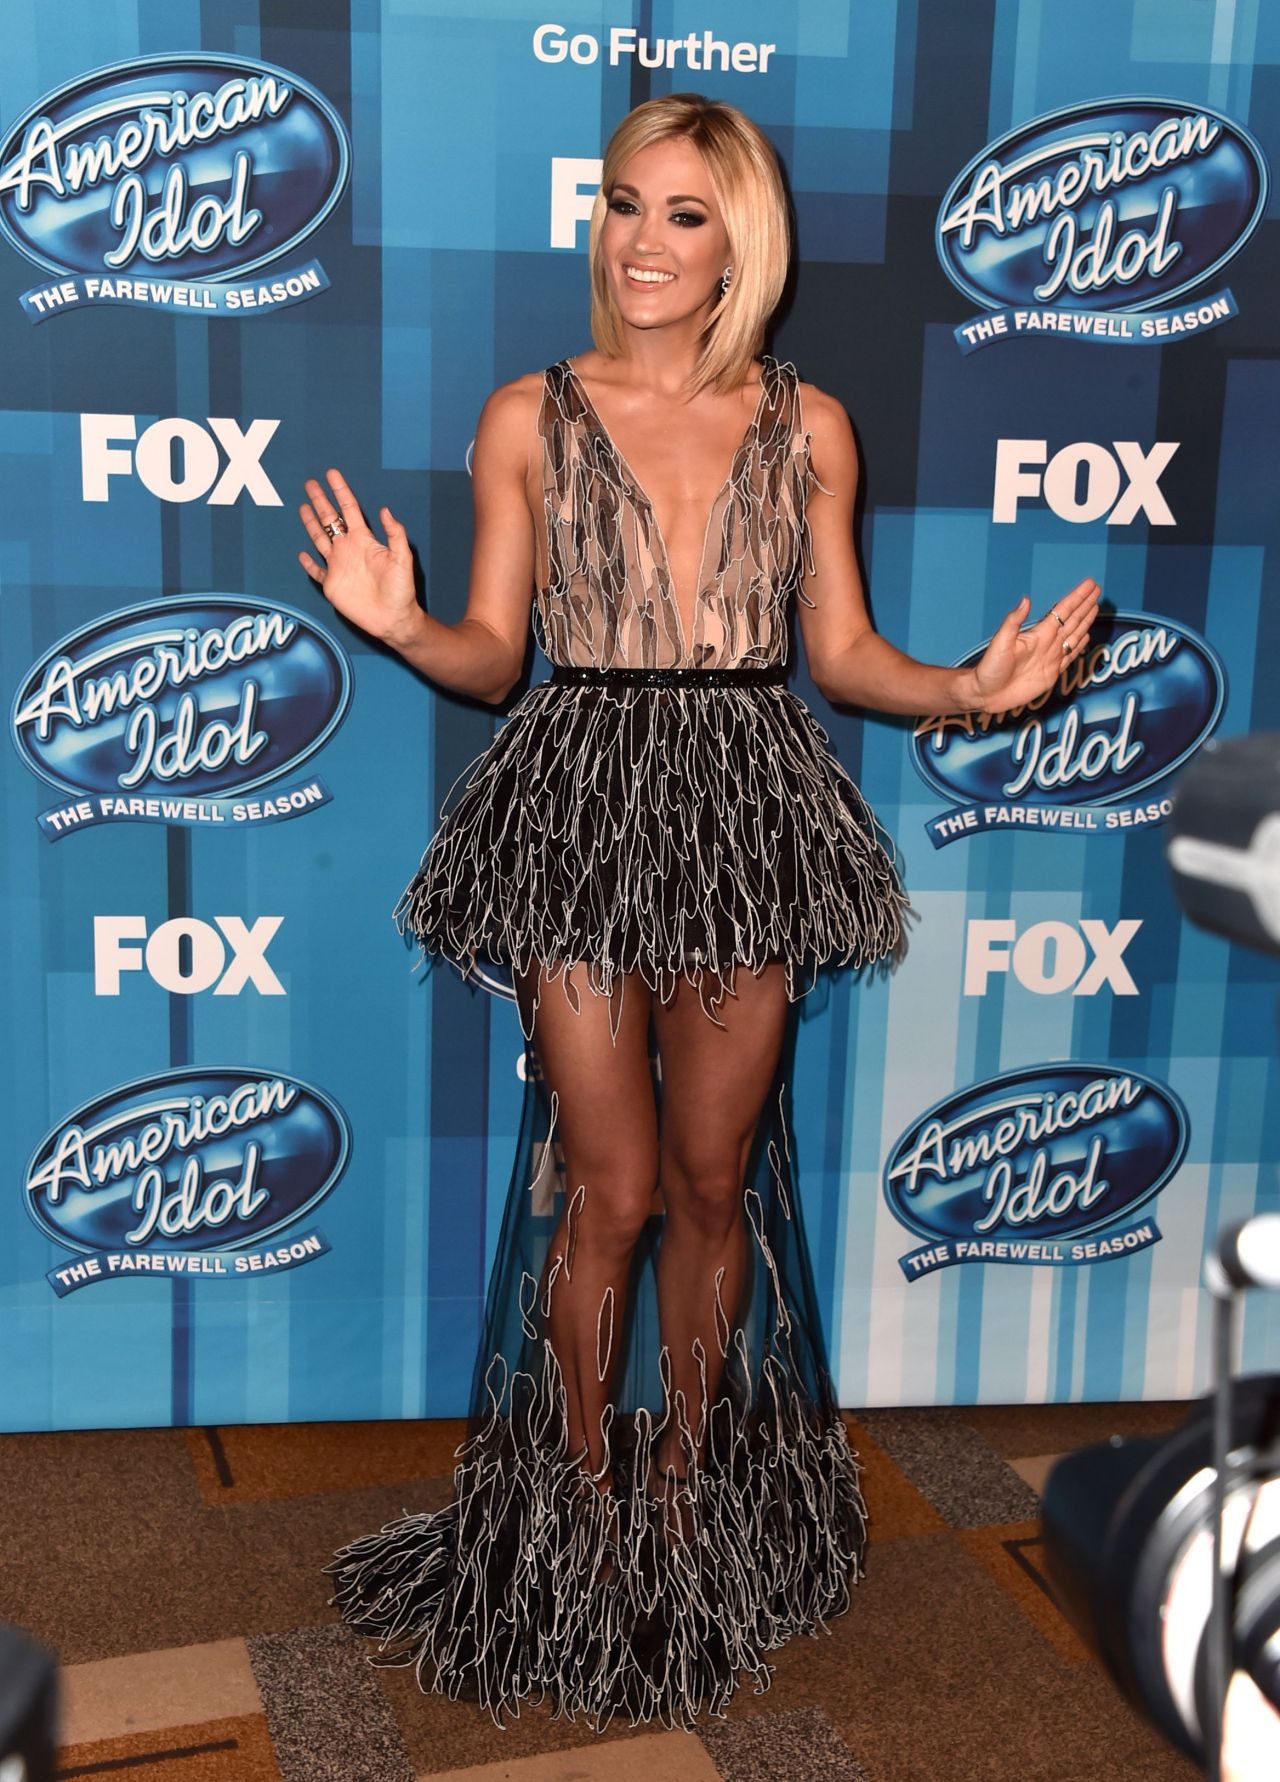 Carrie idol finale upskirt